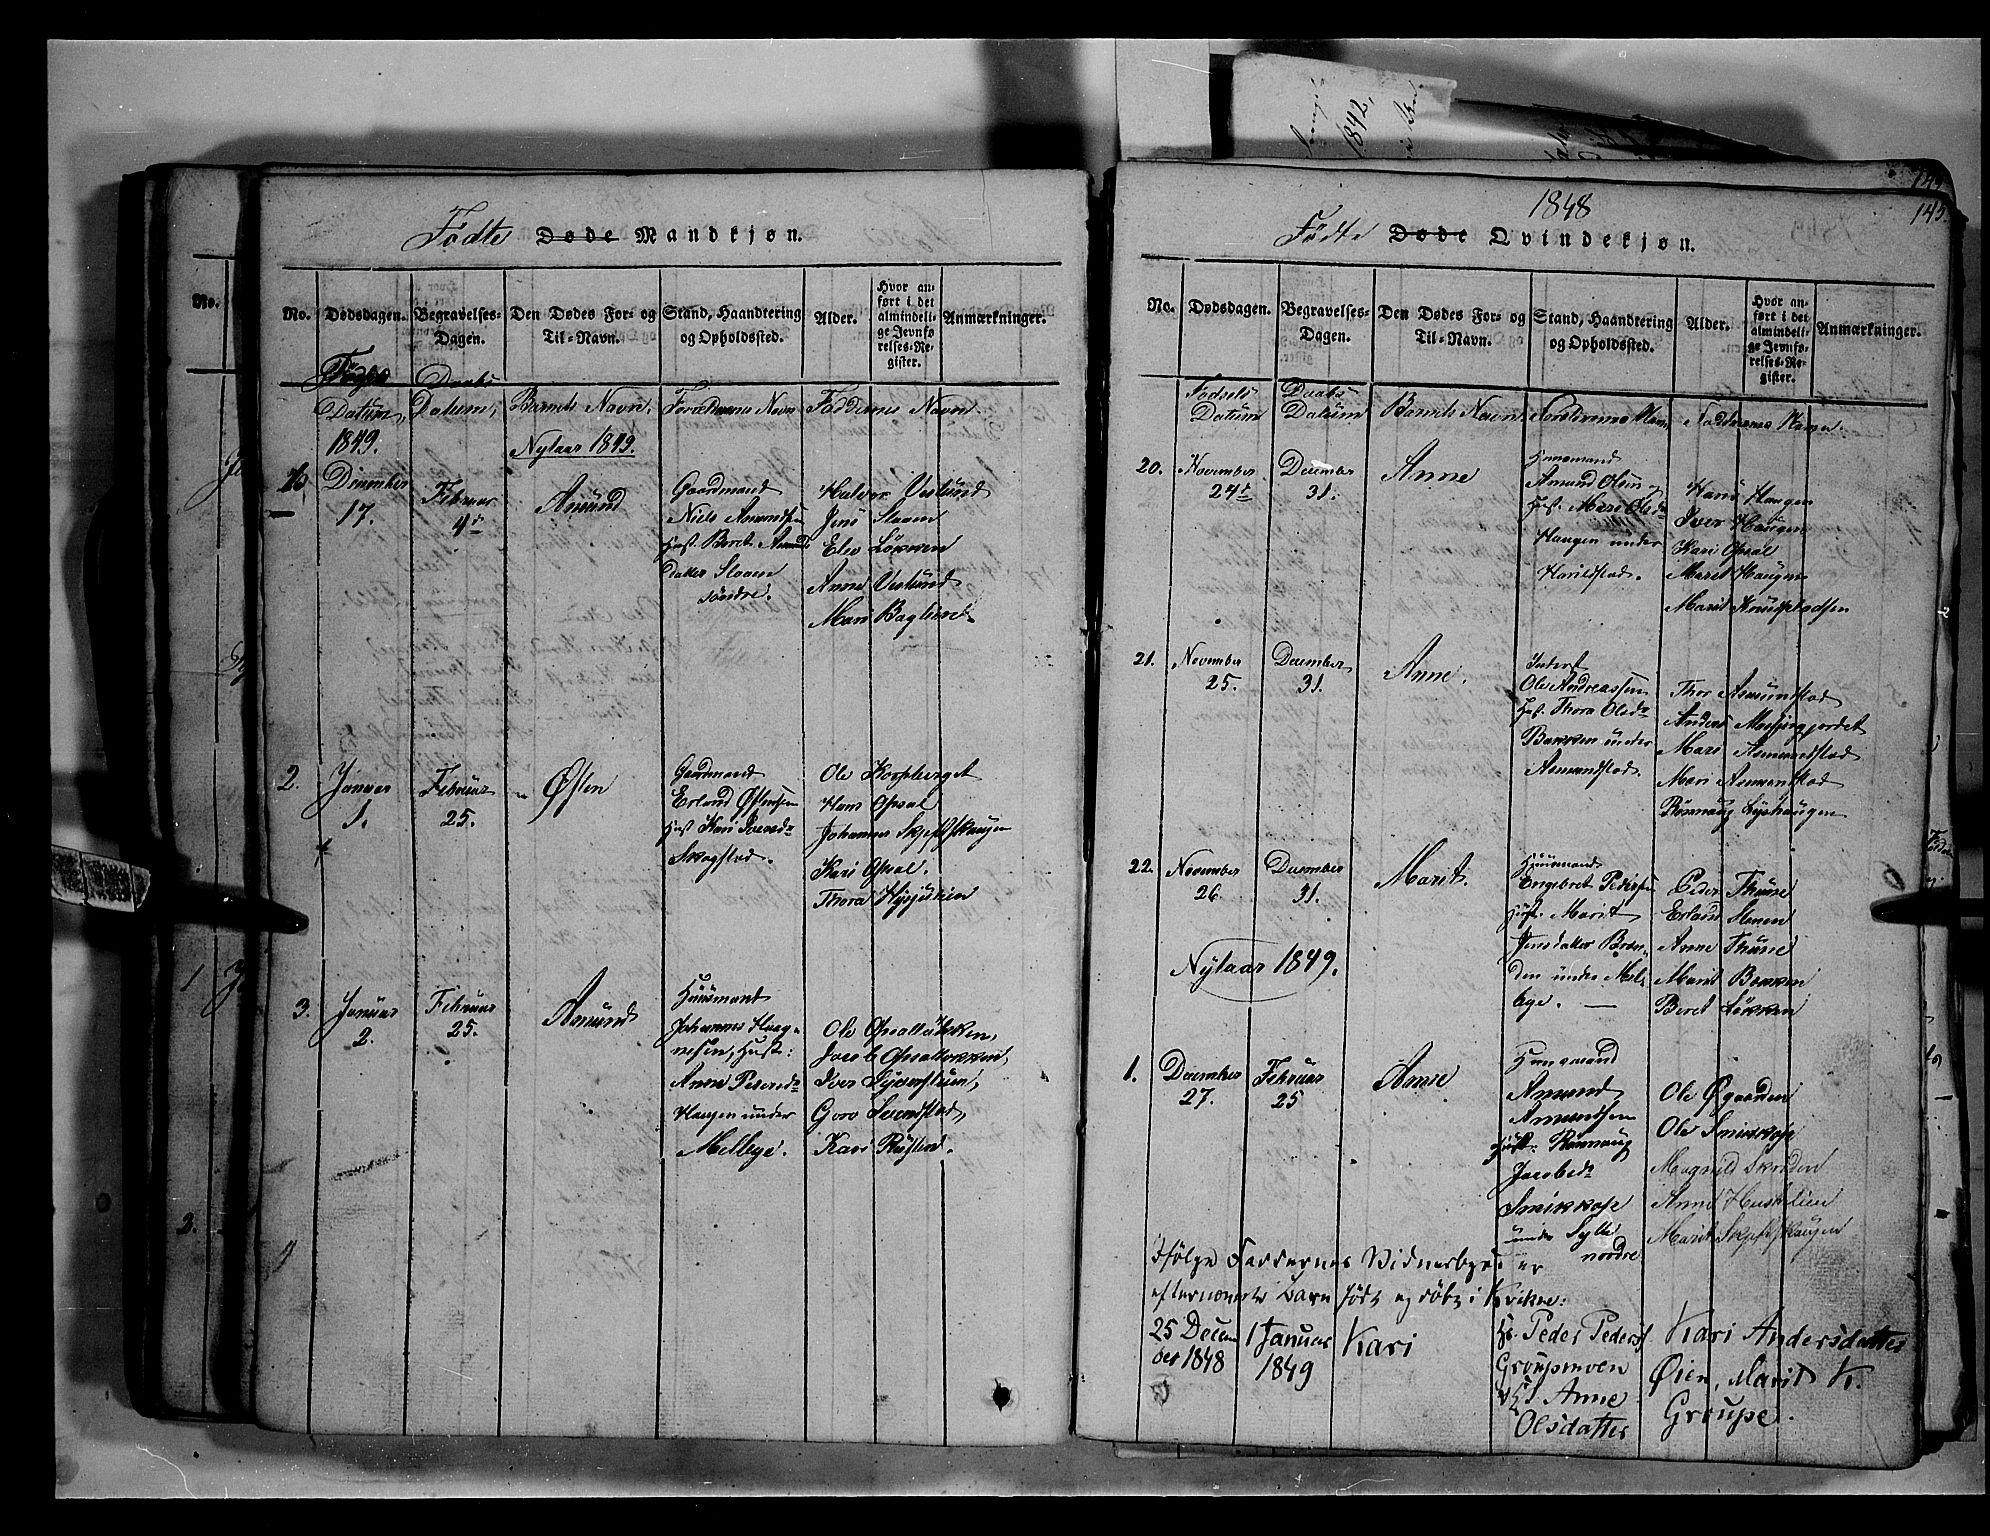 SAH, Fron prestekontor, H/Ha/Hab/L0003: Klokkerbok nr. 3, 1816-1850, s. 145